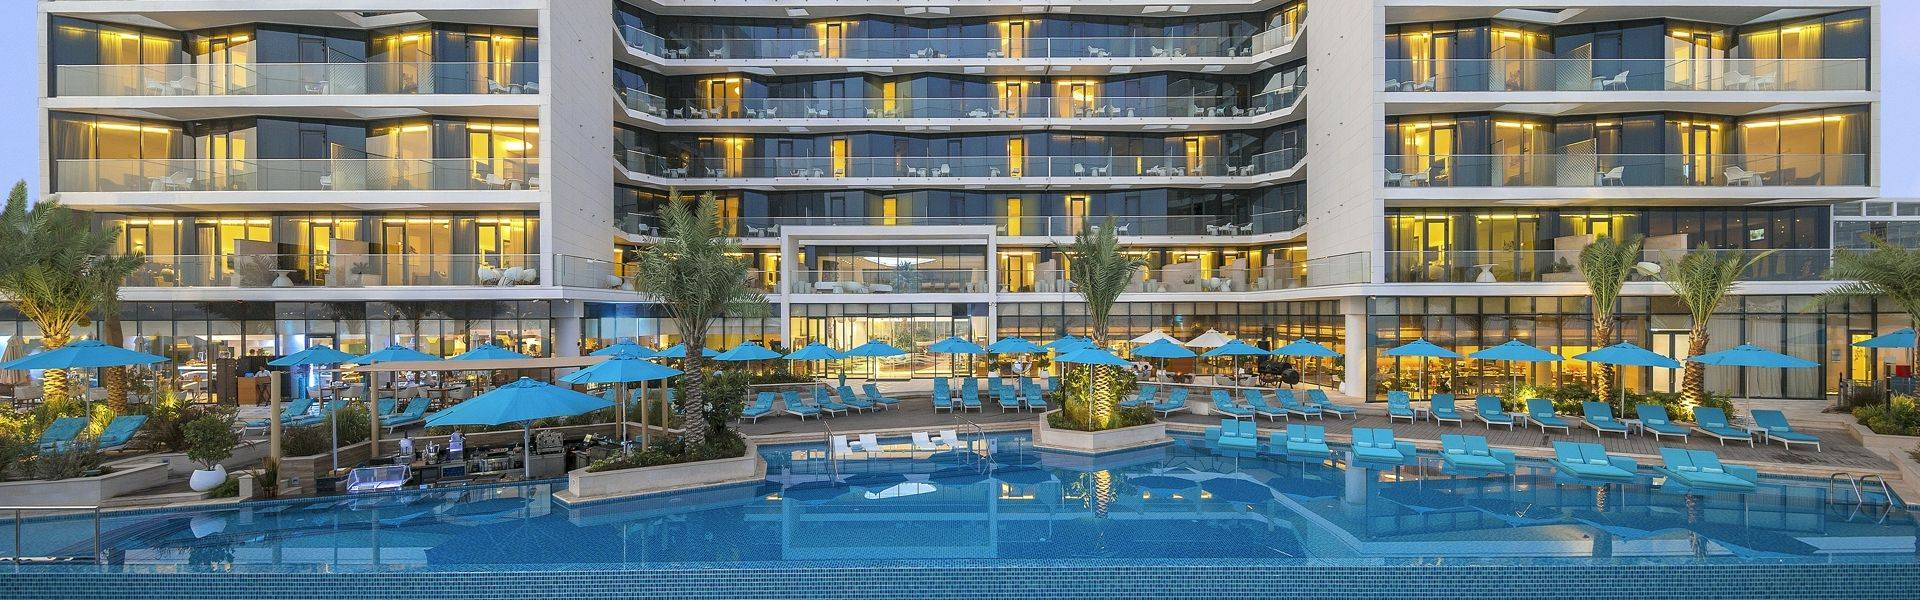 Exterior -The Retreat Palm Dubai MGallery by Sofitel.jpg